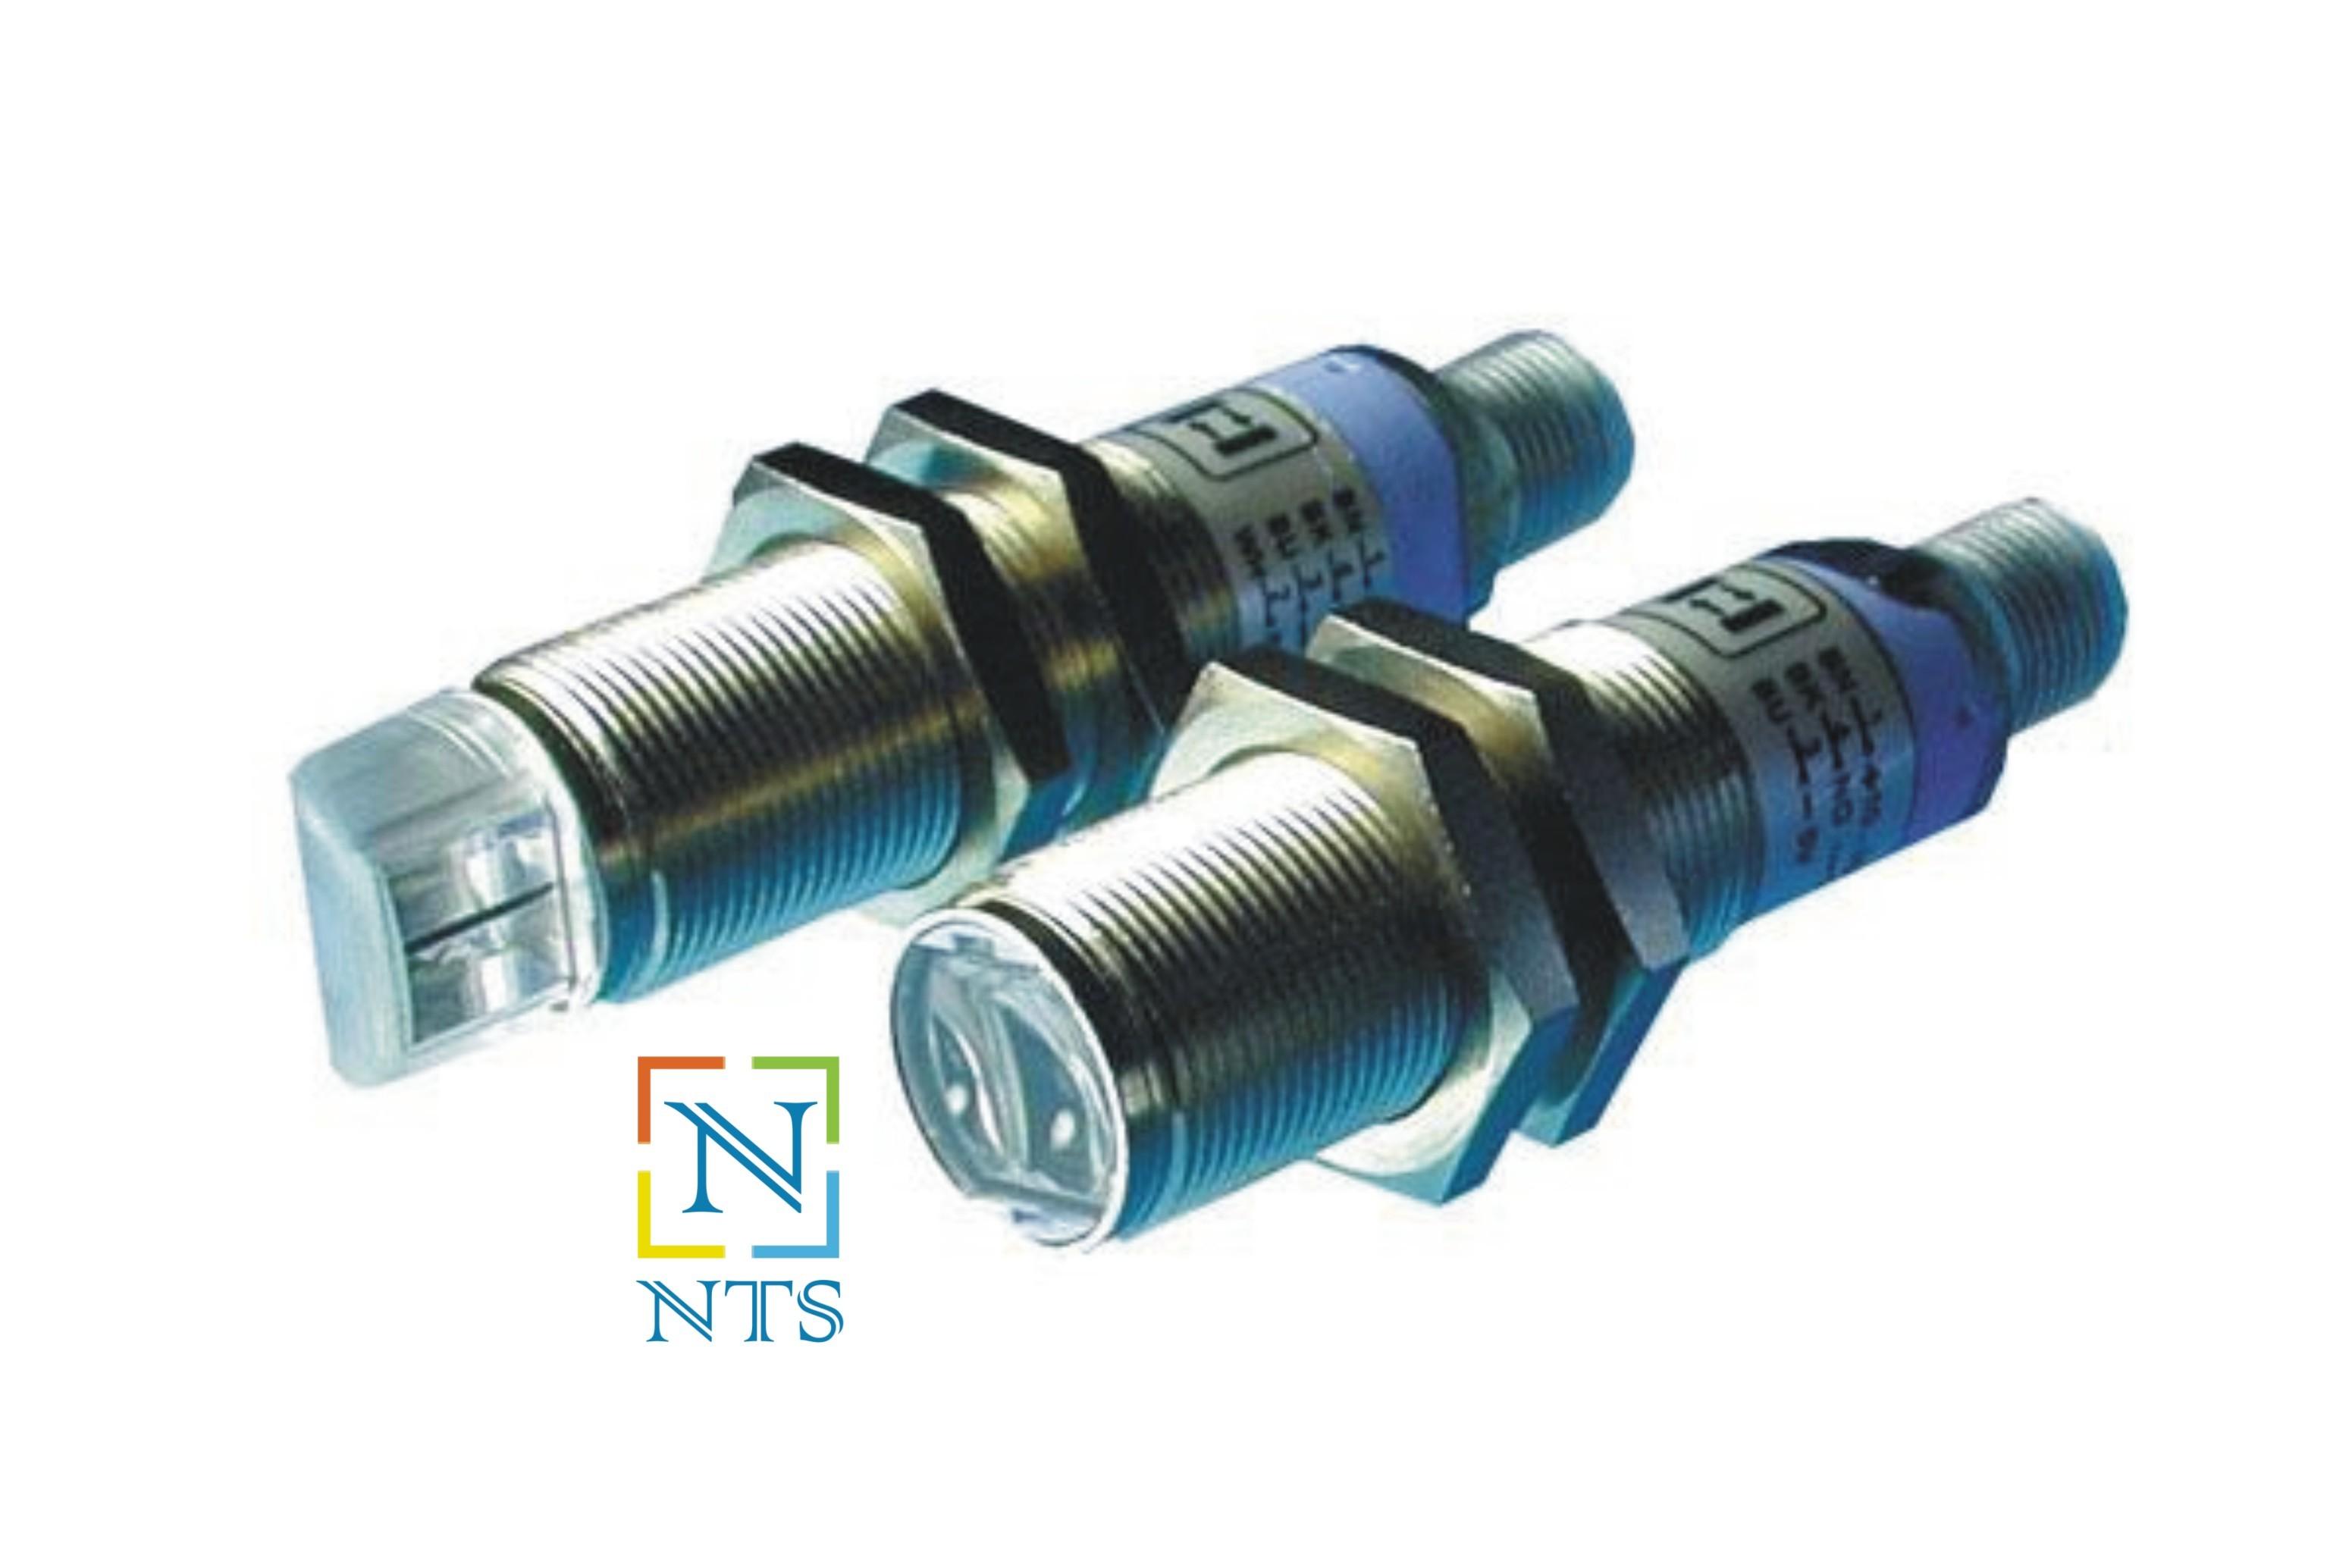 DataLogic S51-MA-5-C10-NK Photoelectric Sensor